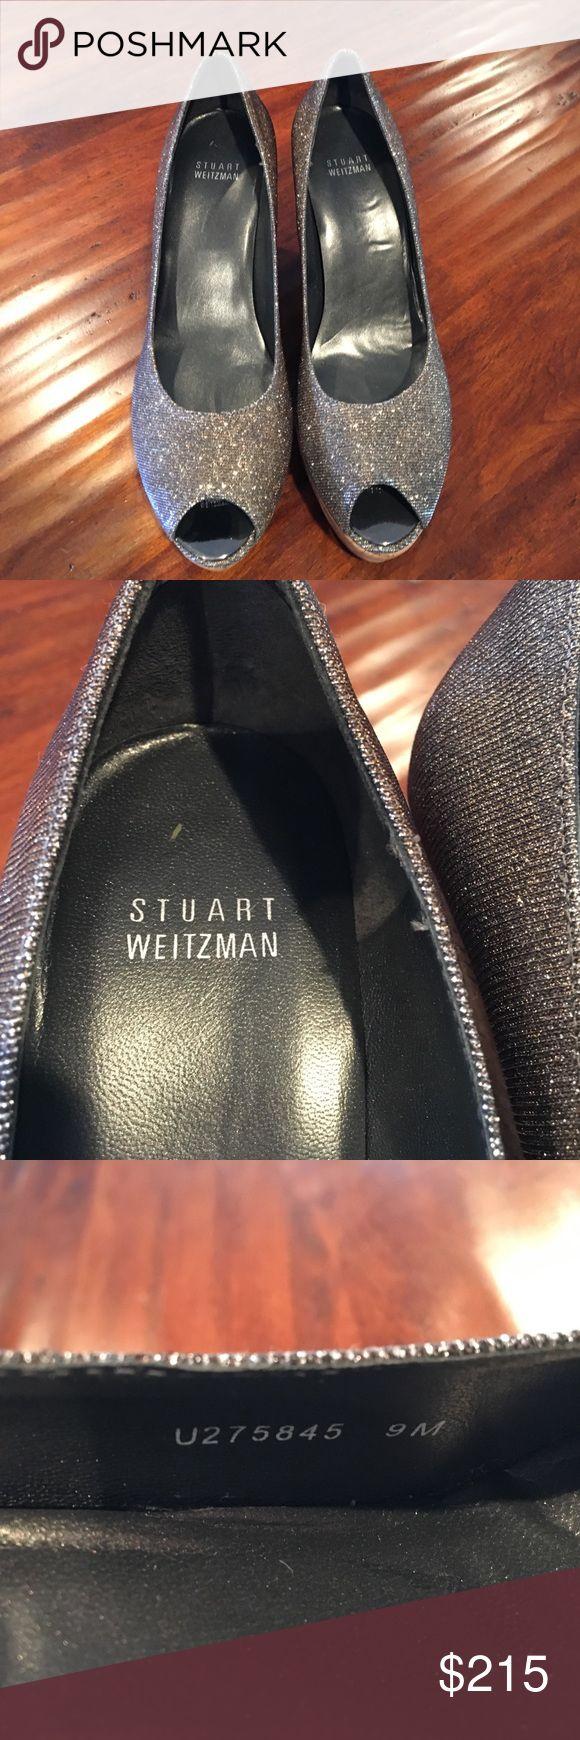 Stuart Weitzman metallic wedge heels Beautiful shoe, worn to one event, peep toe cork heel, ready to wear for spring or summer, casual or dressy Stuart Weitzman Shoes Wedges